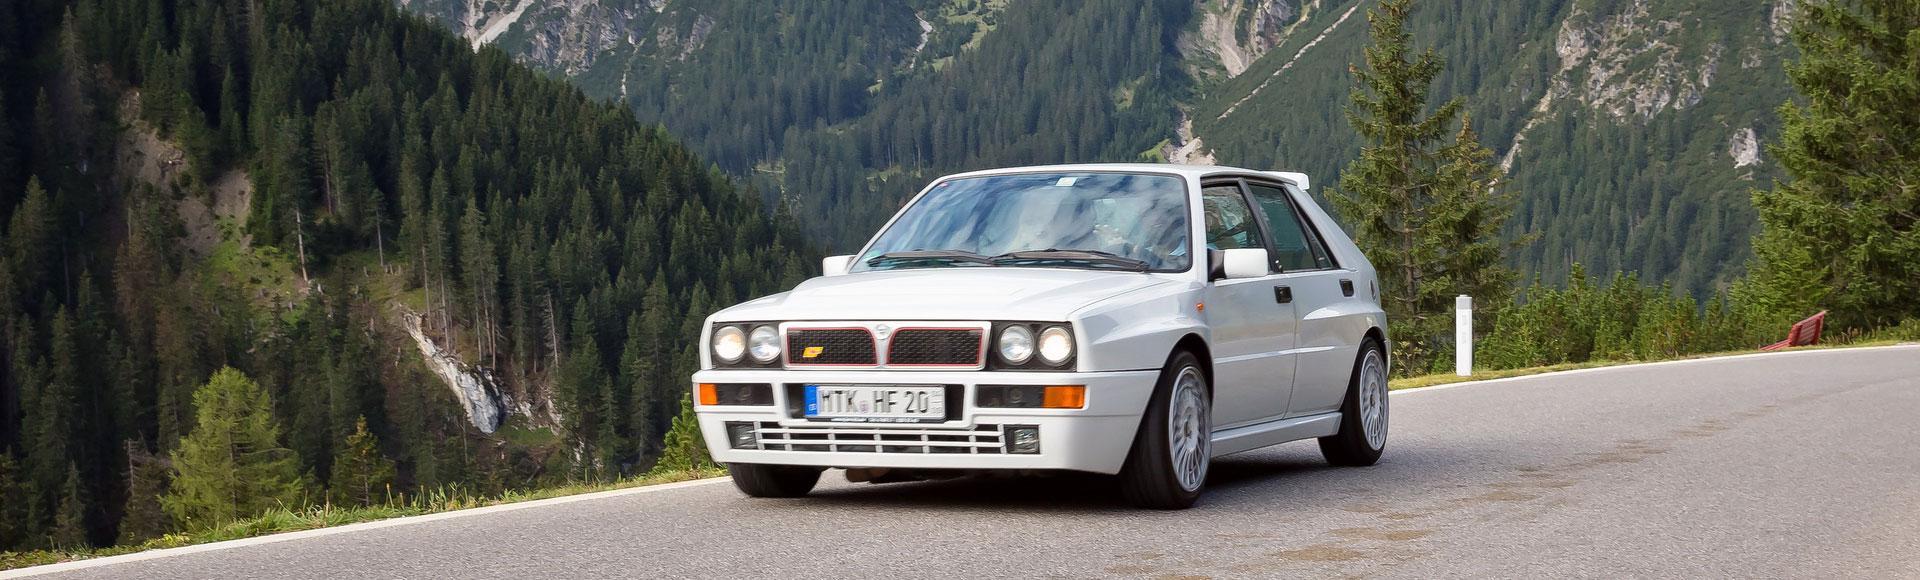 Lancia Delta Integrale 0068 Sommer